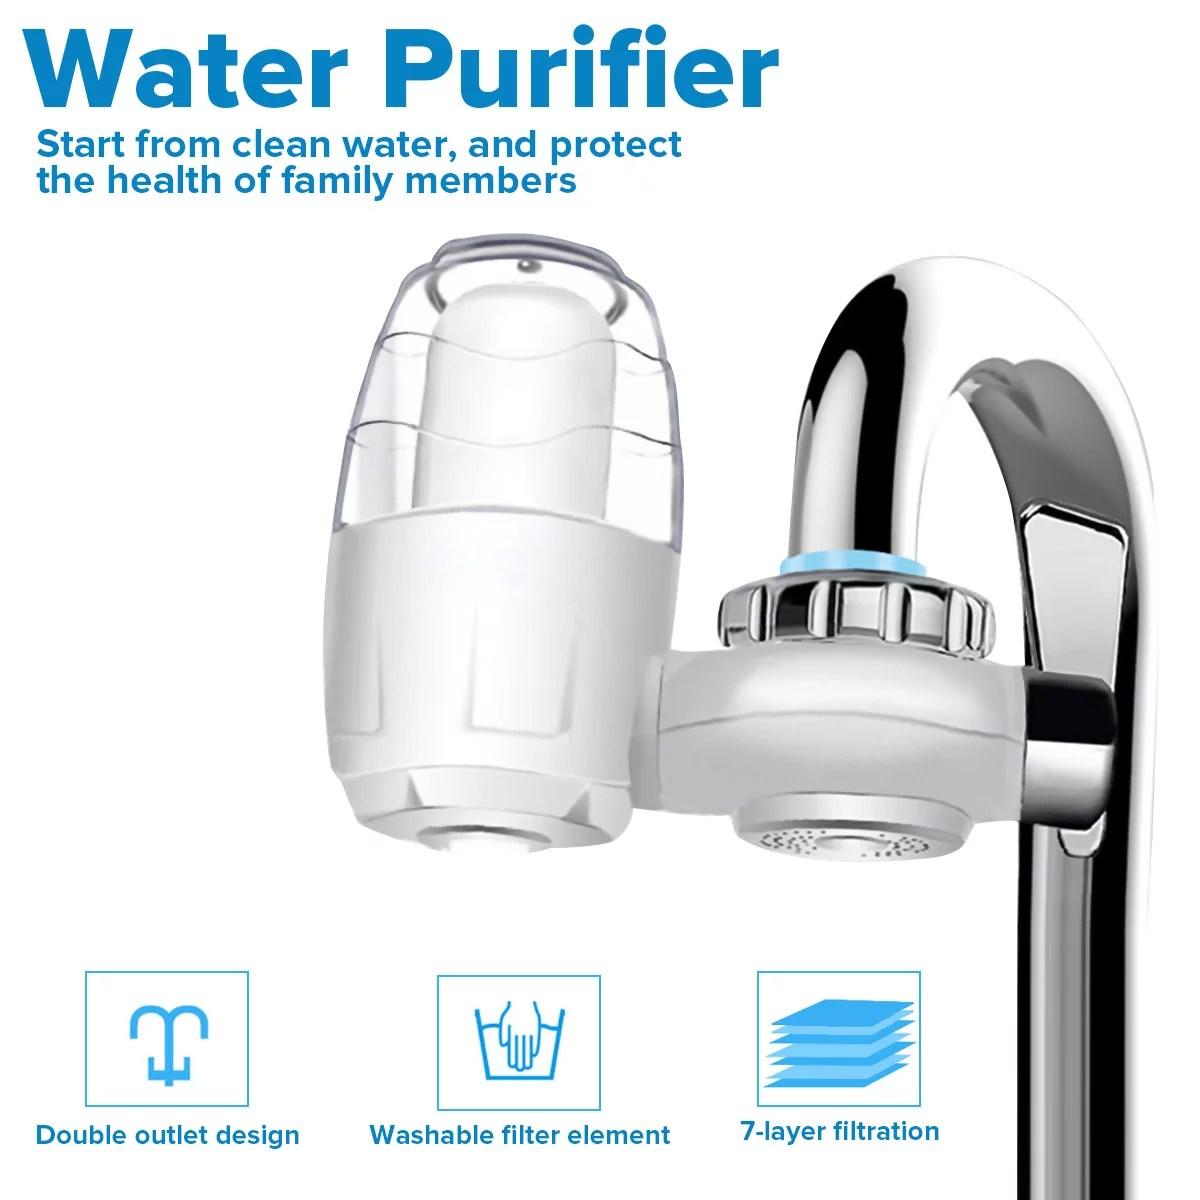 augienb kitchen 7 layer filter tap water purifier water purifier system home faucet filter purifier